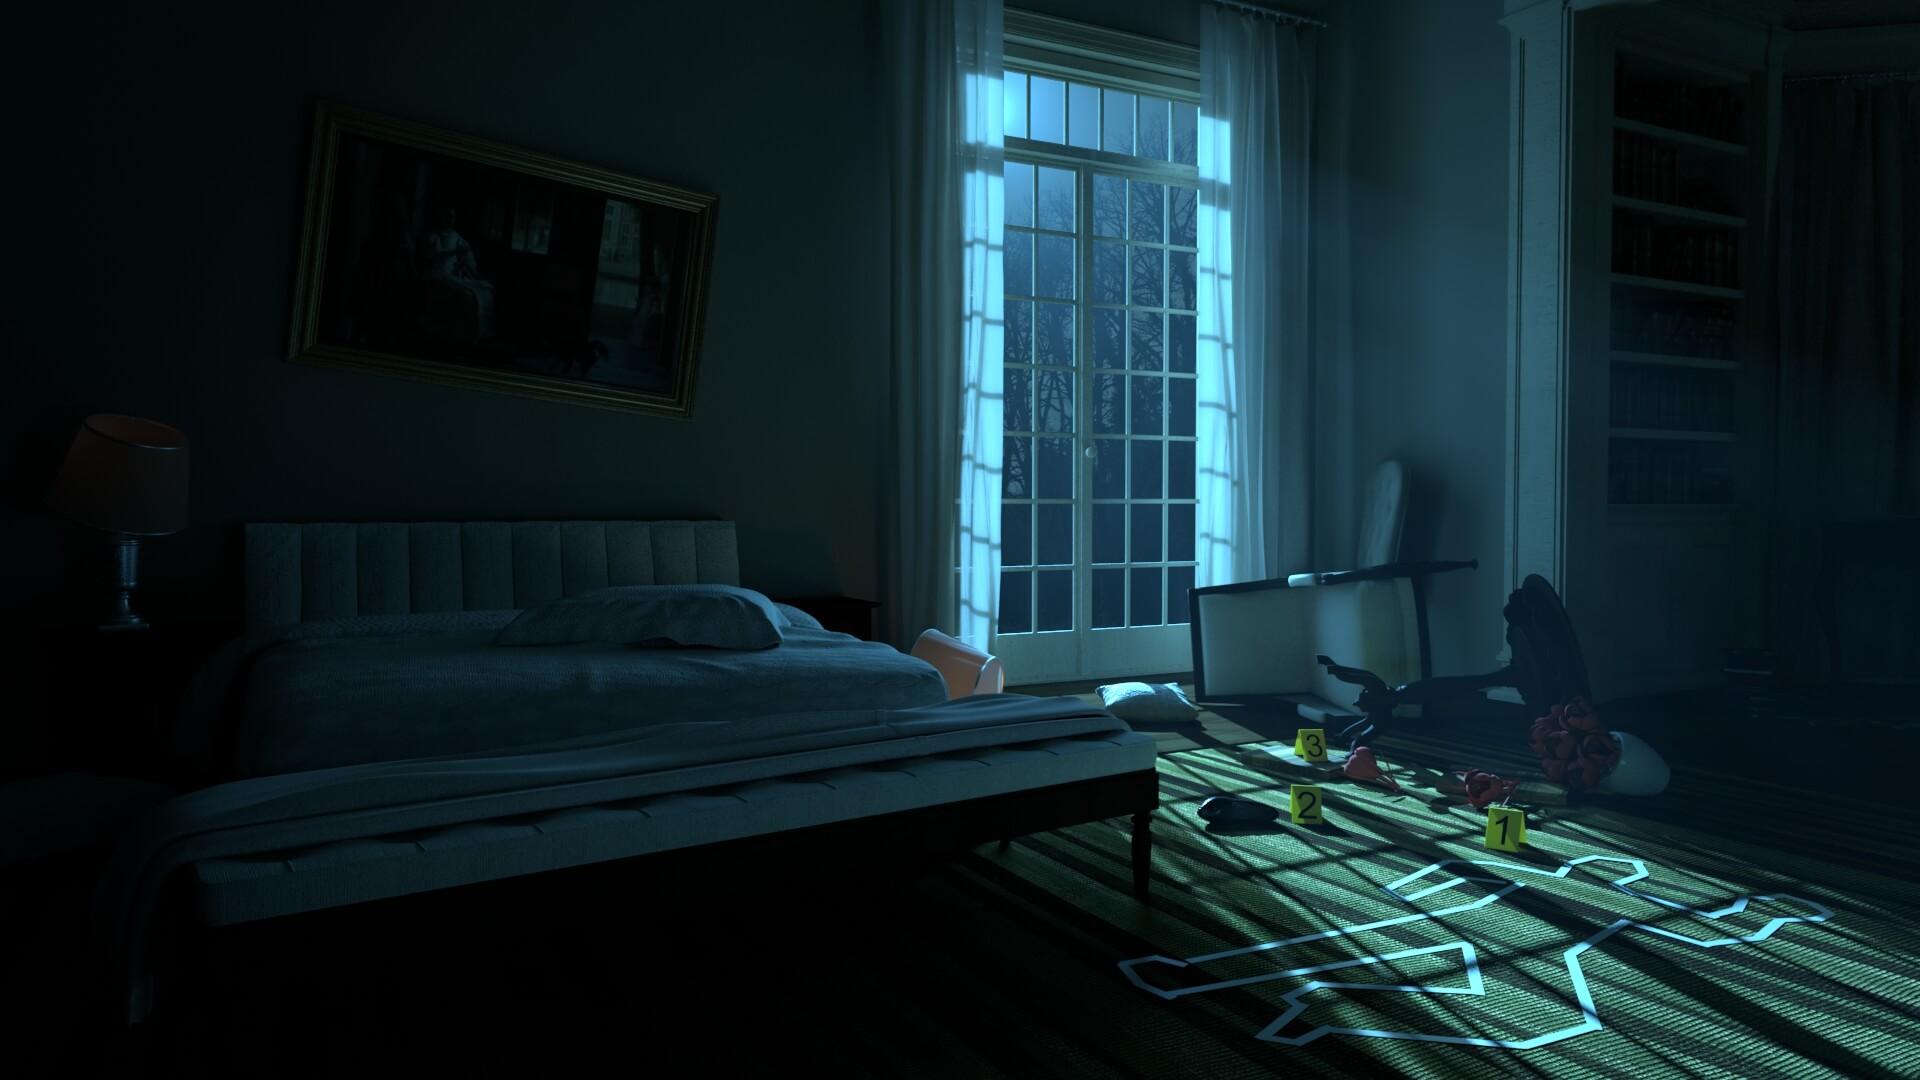 0_crime_bedroom_beauty_web.jpg